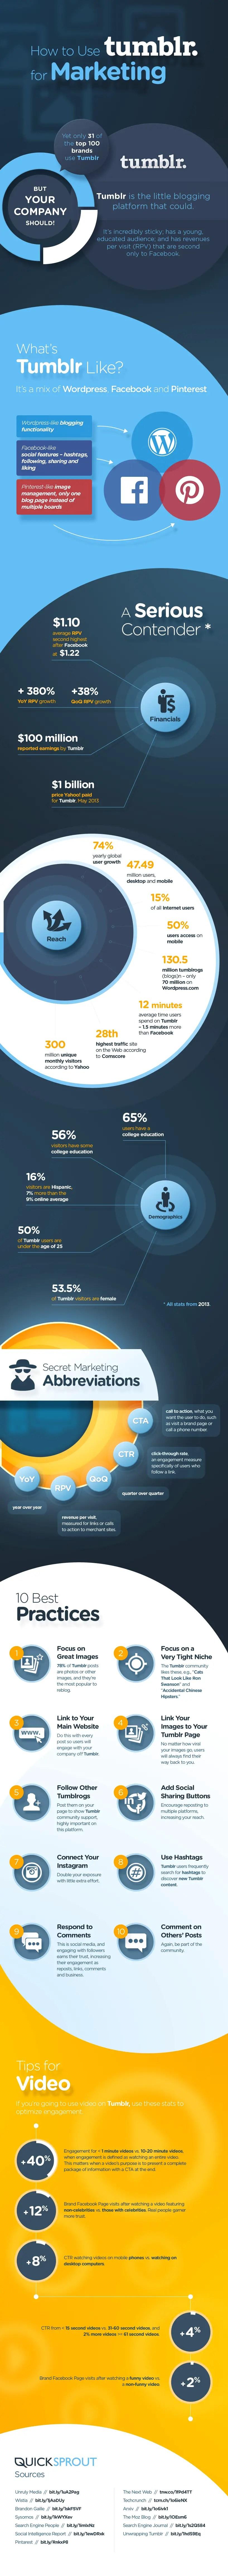 wersm_tumblr_marketing_infographic